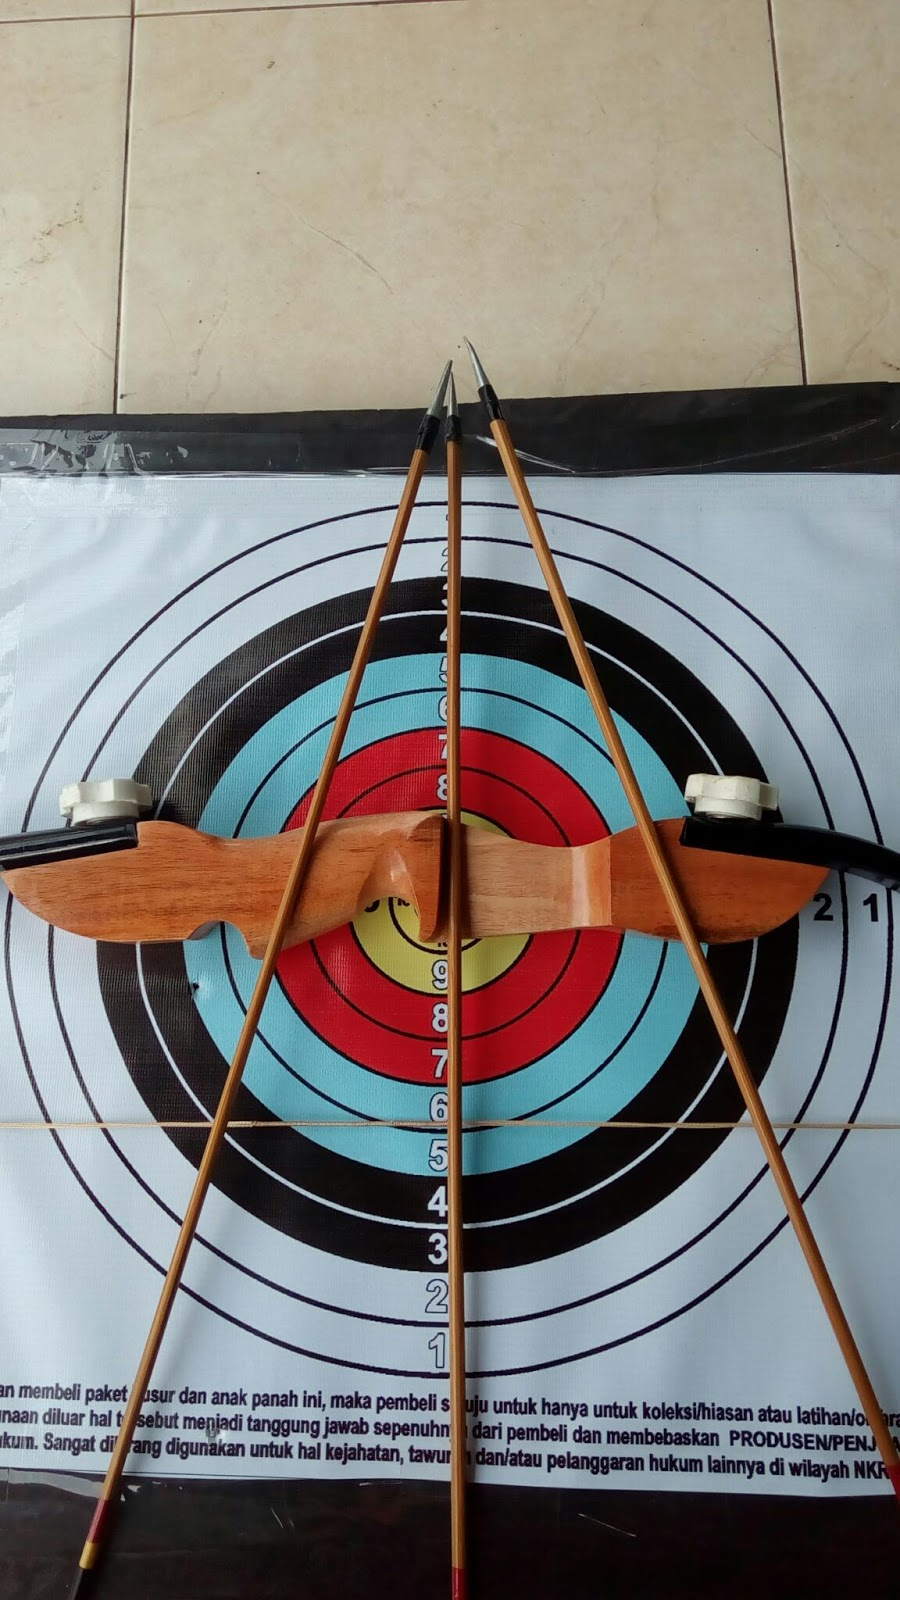 Kios Panah Arjuna Archery Kreasi Panahan Kontemporer Jual Busur Panah